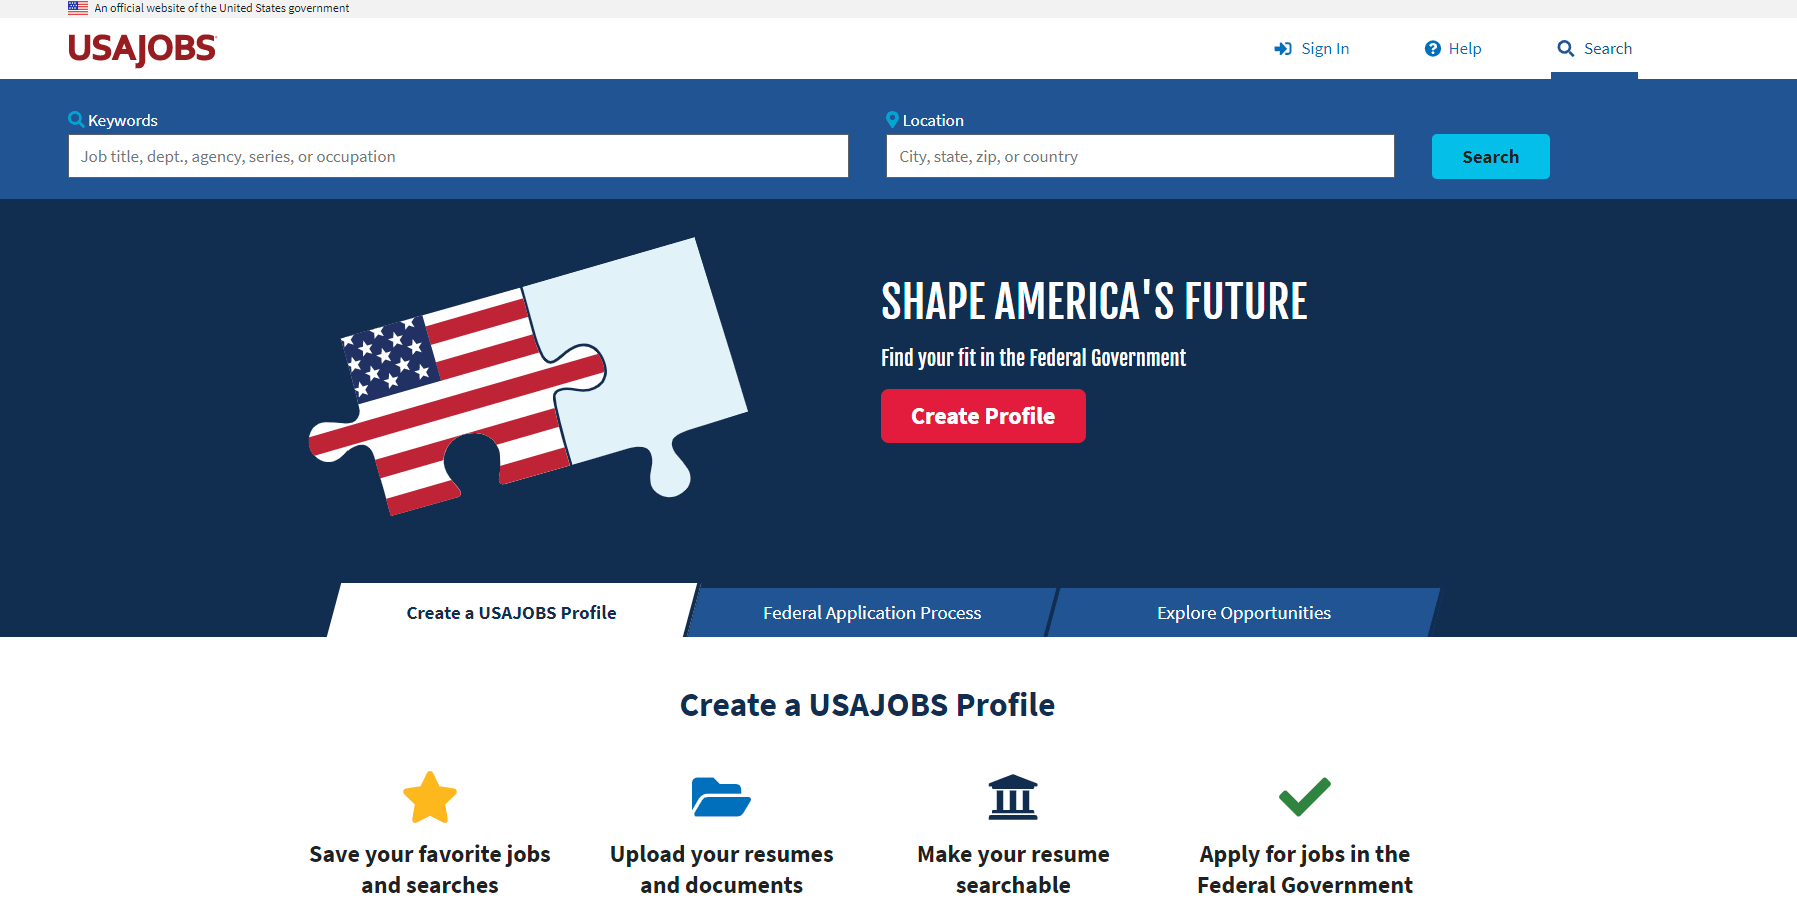 USAJobs